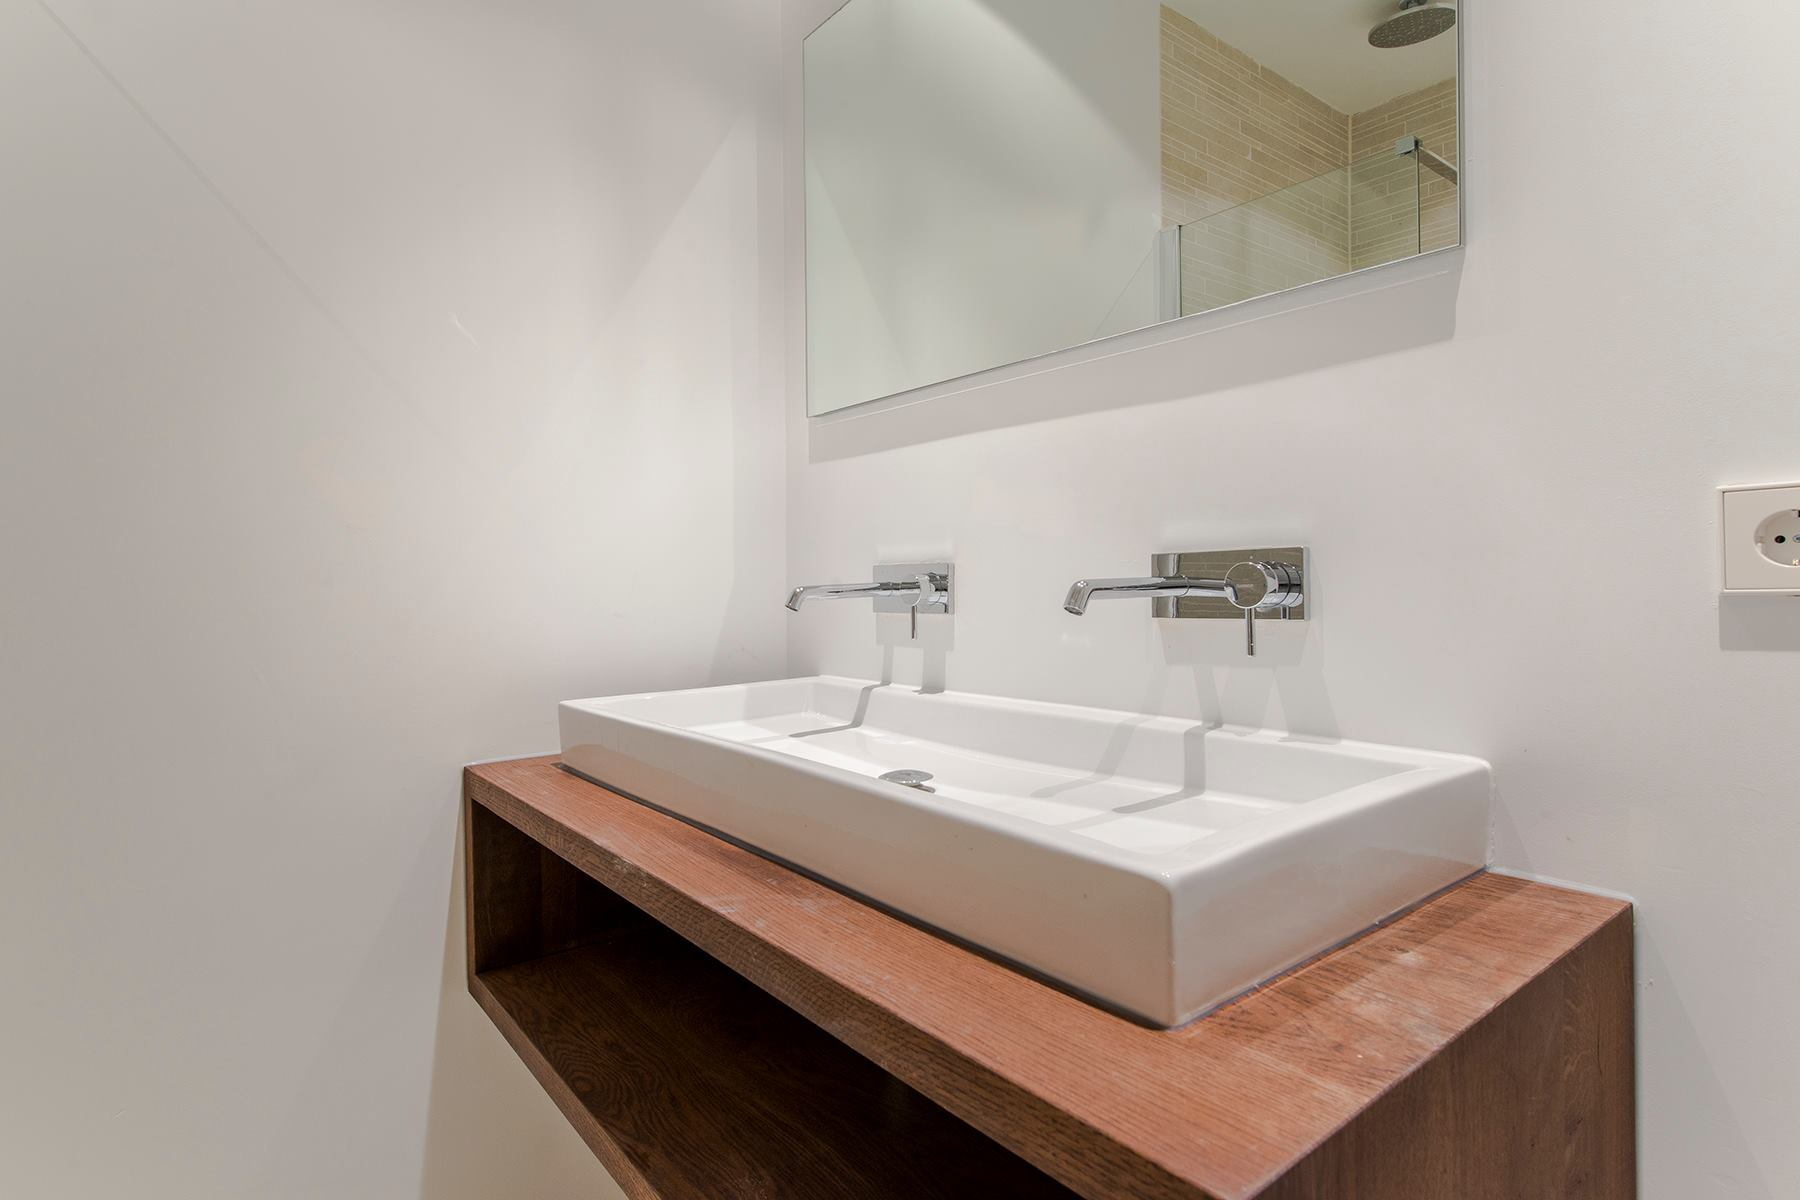 Nieuwe Badkamer Amsterdam : Nieuwe achtergracht amsterdam biloxi vastgoed b v badkamer